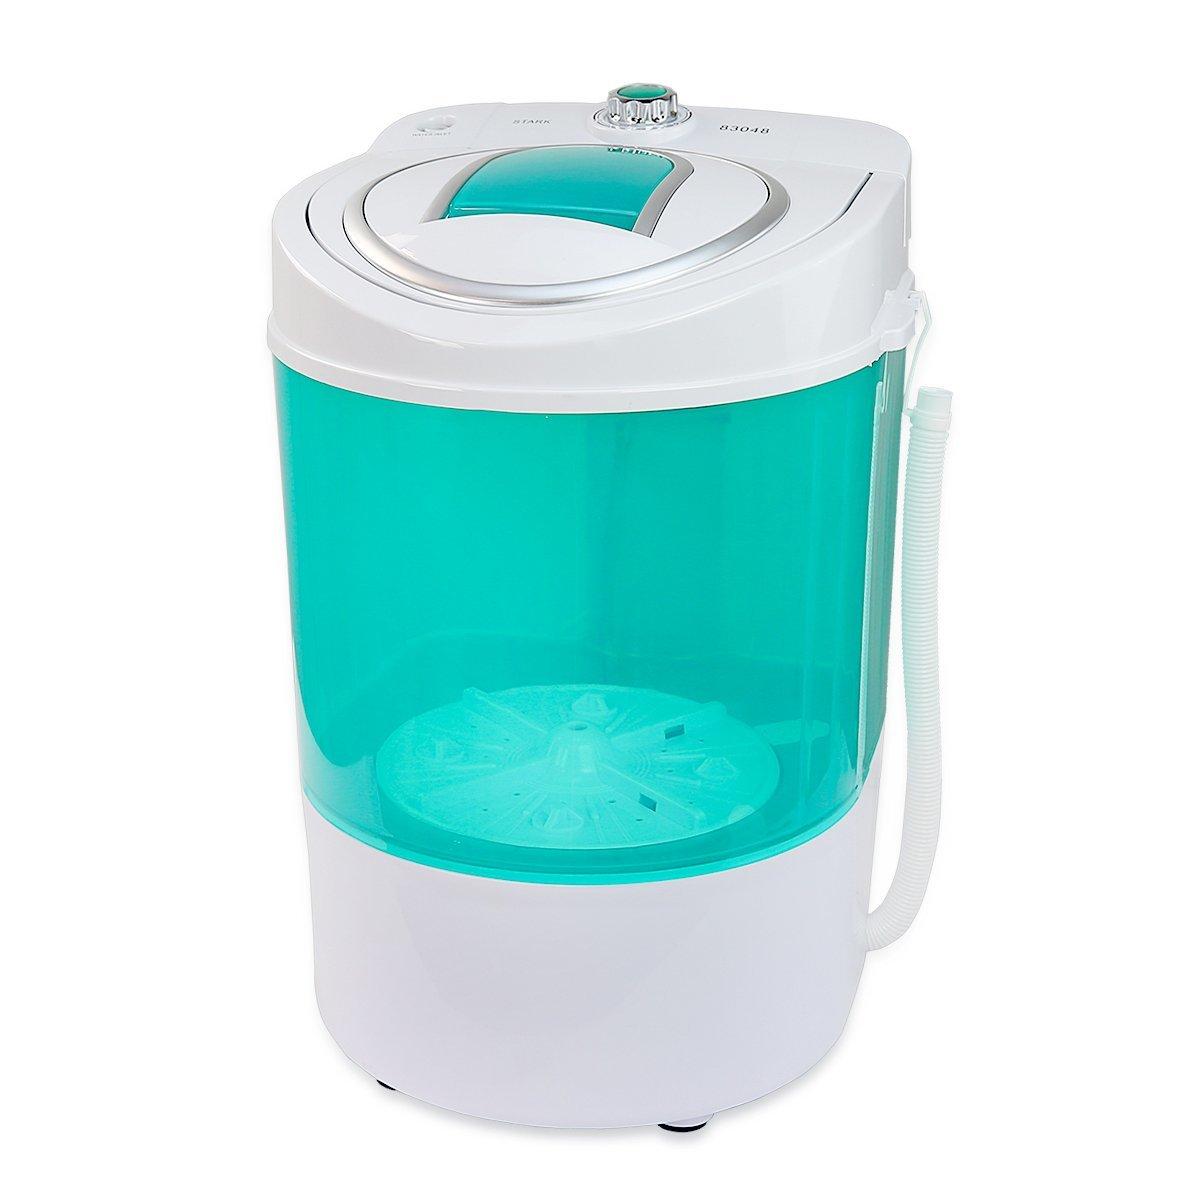 electric small mini portable compact washer washing machine